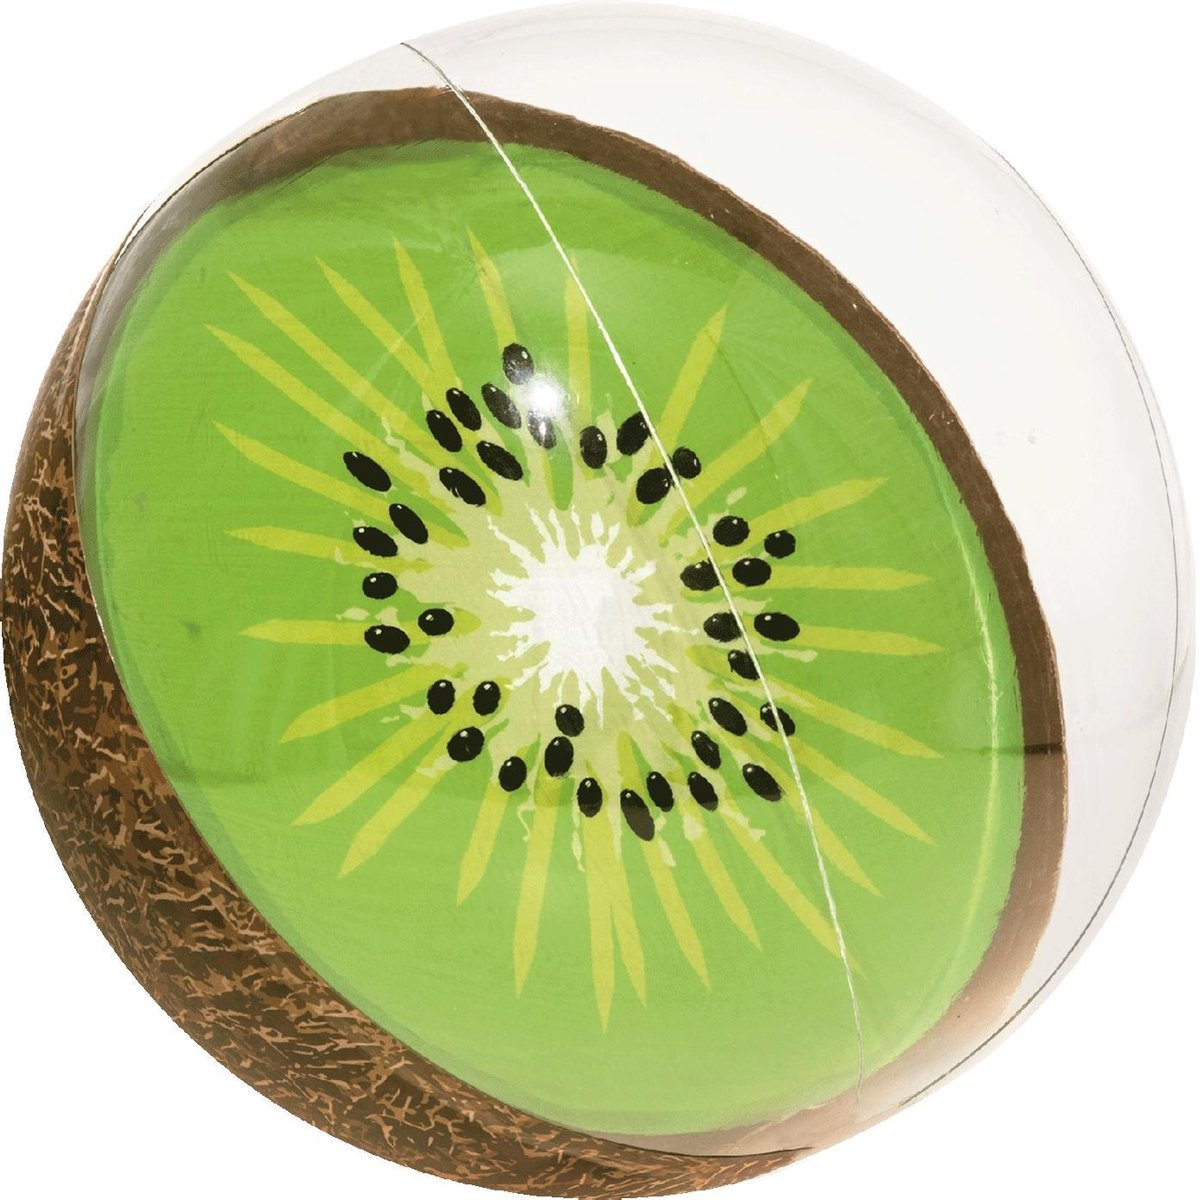 Opblaas Strandbal 'Fruity' 46 cm | kiwi